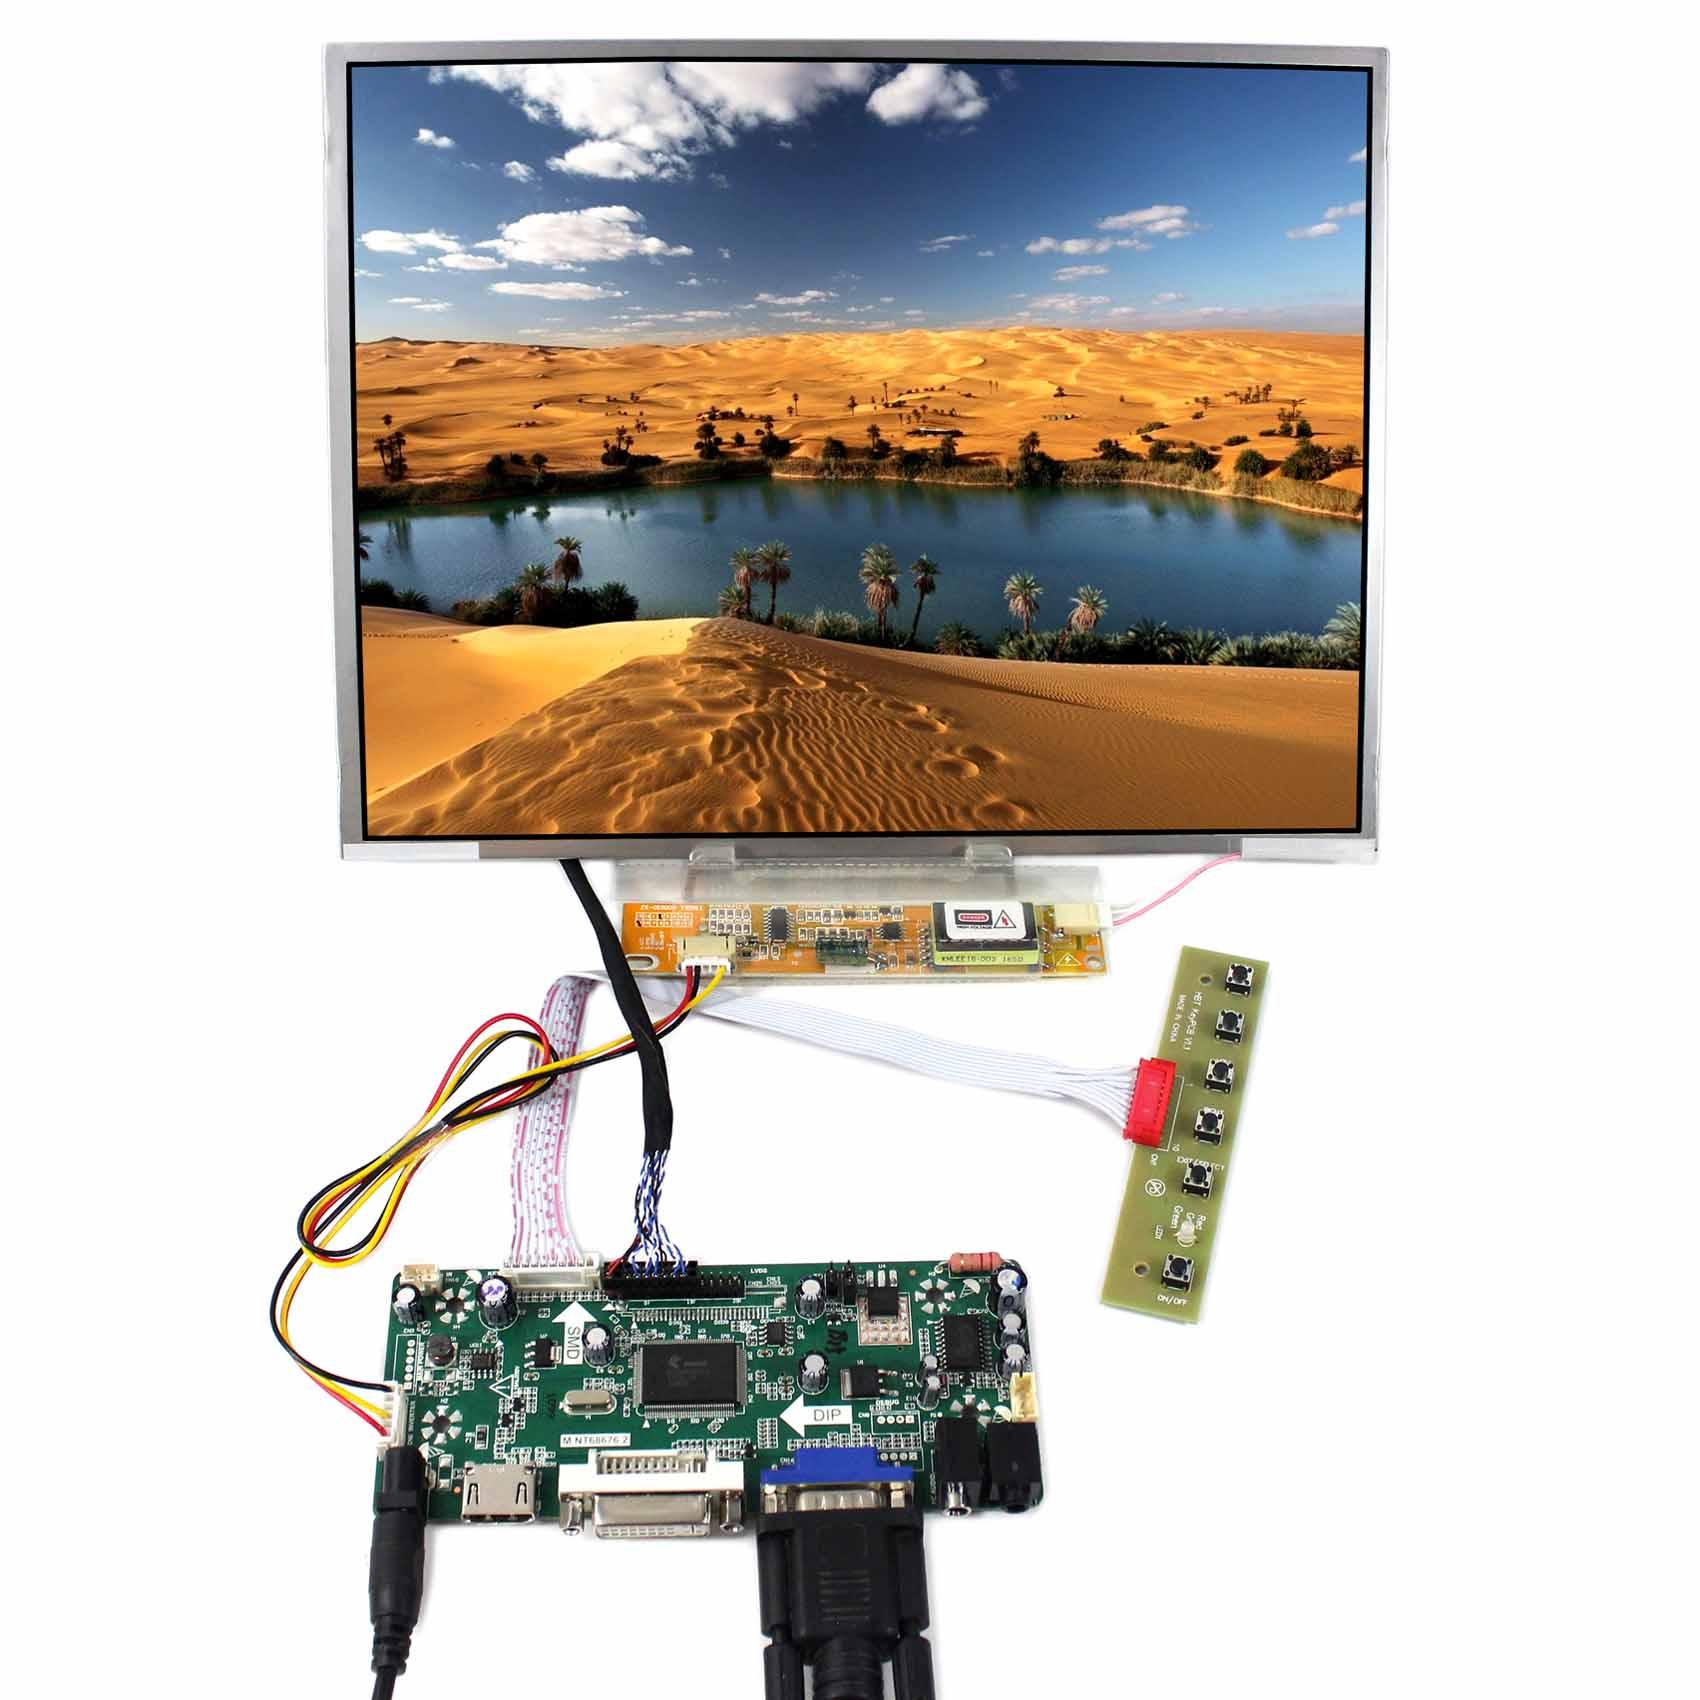 12.1 LCD Display 1024x768 1CCFL Backlight HDMI VGA DVI Audio LCD Controller Board12.1 LCD Display 1024x768 1CCFL Backlight HDMI VGA DVI Audio LCD Controller Board